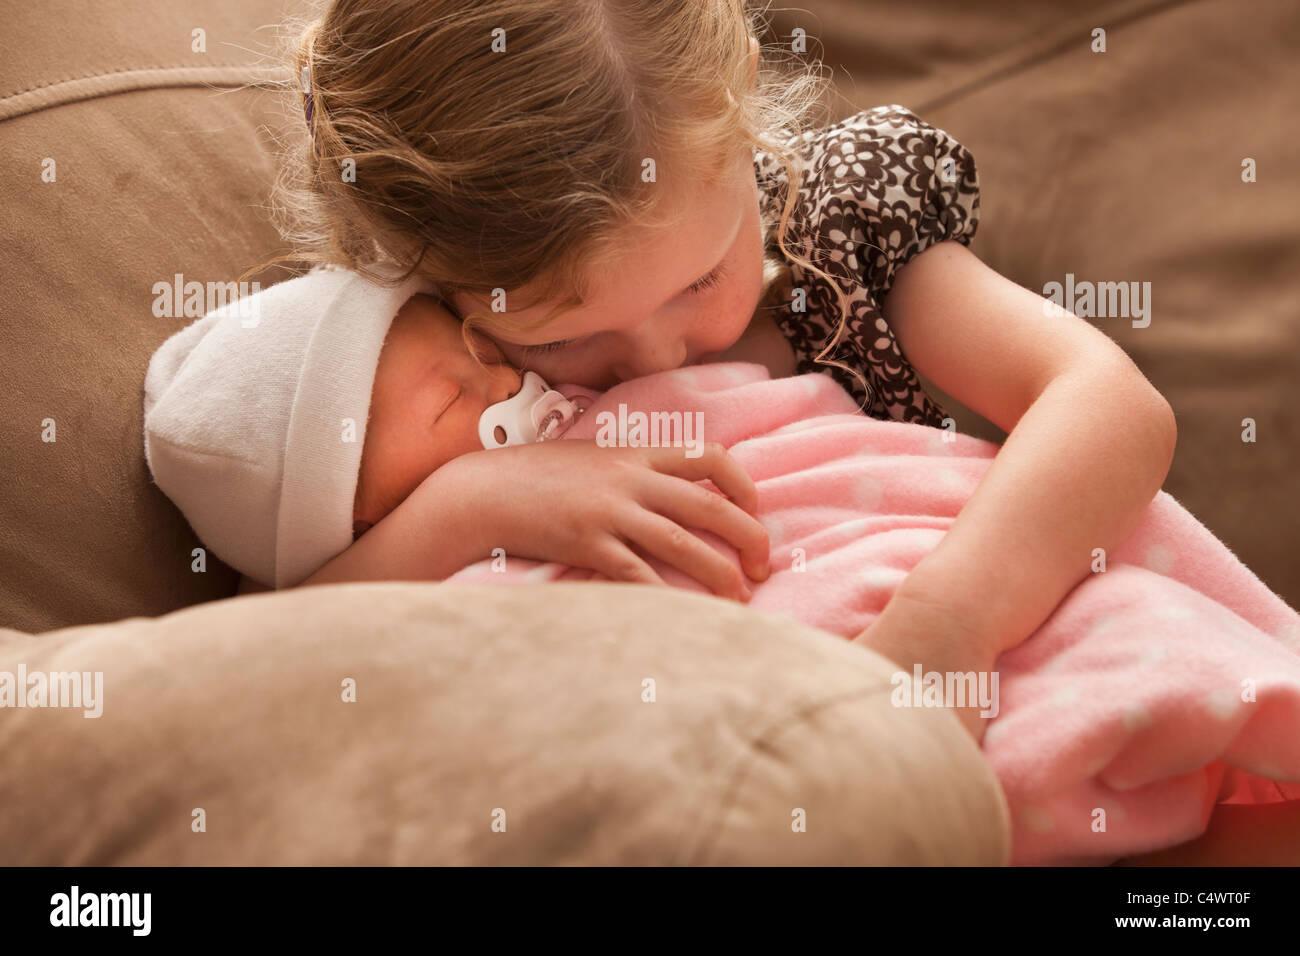 USA, Utah, Lehi, Mädchen (2-3) umfassende Babyschwester auf sofa Stockfoto